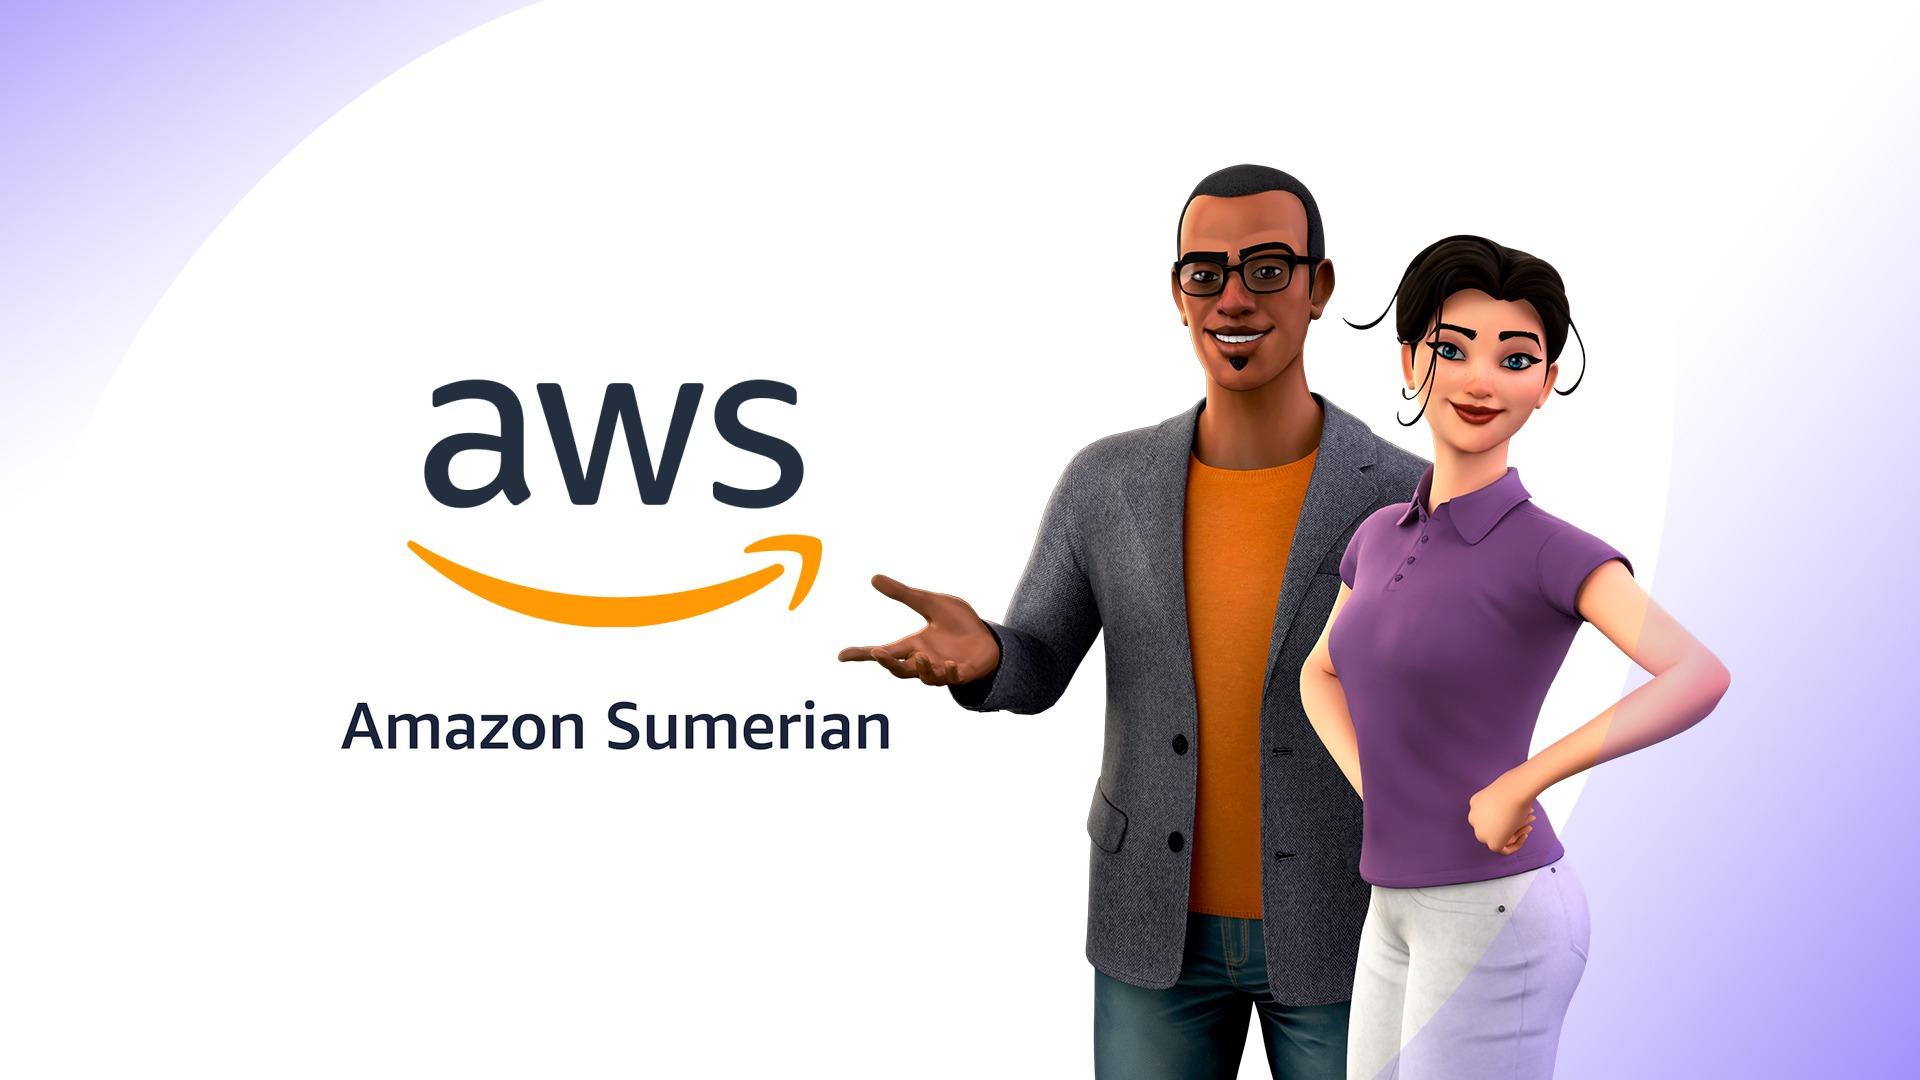 [TeamStudy-025] AWS Sumerian